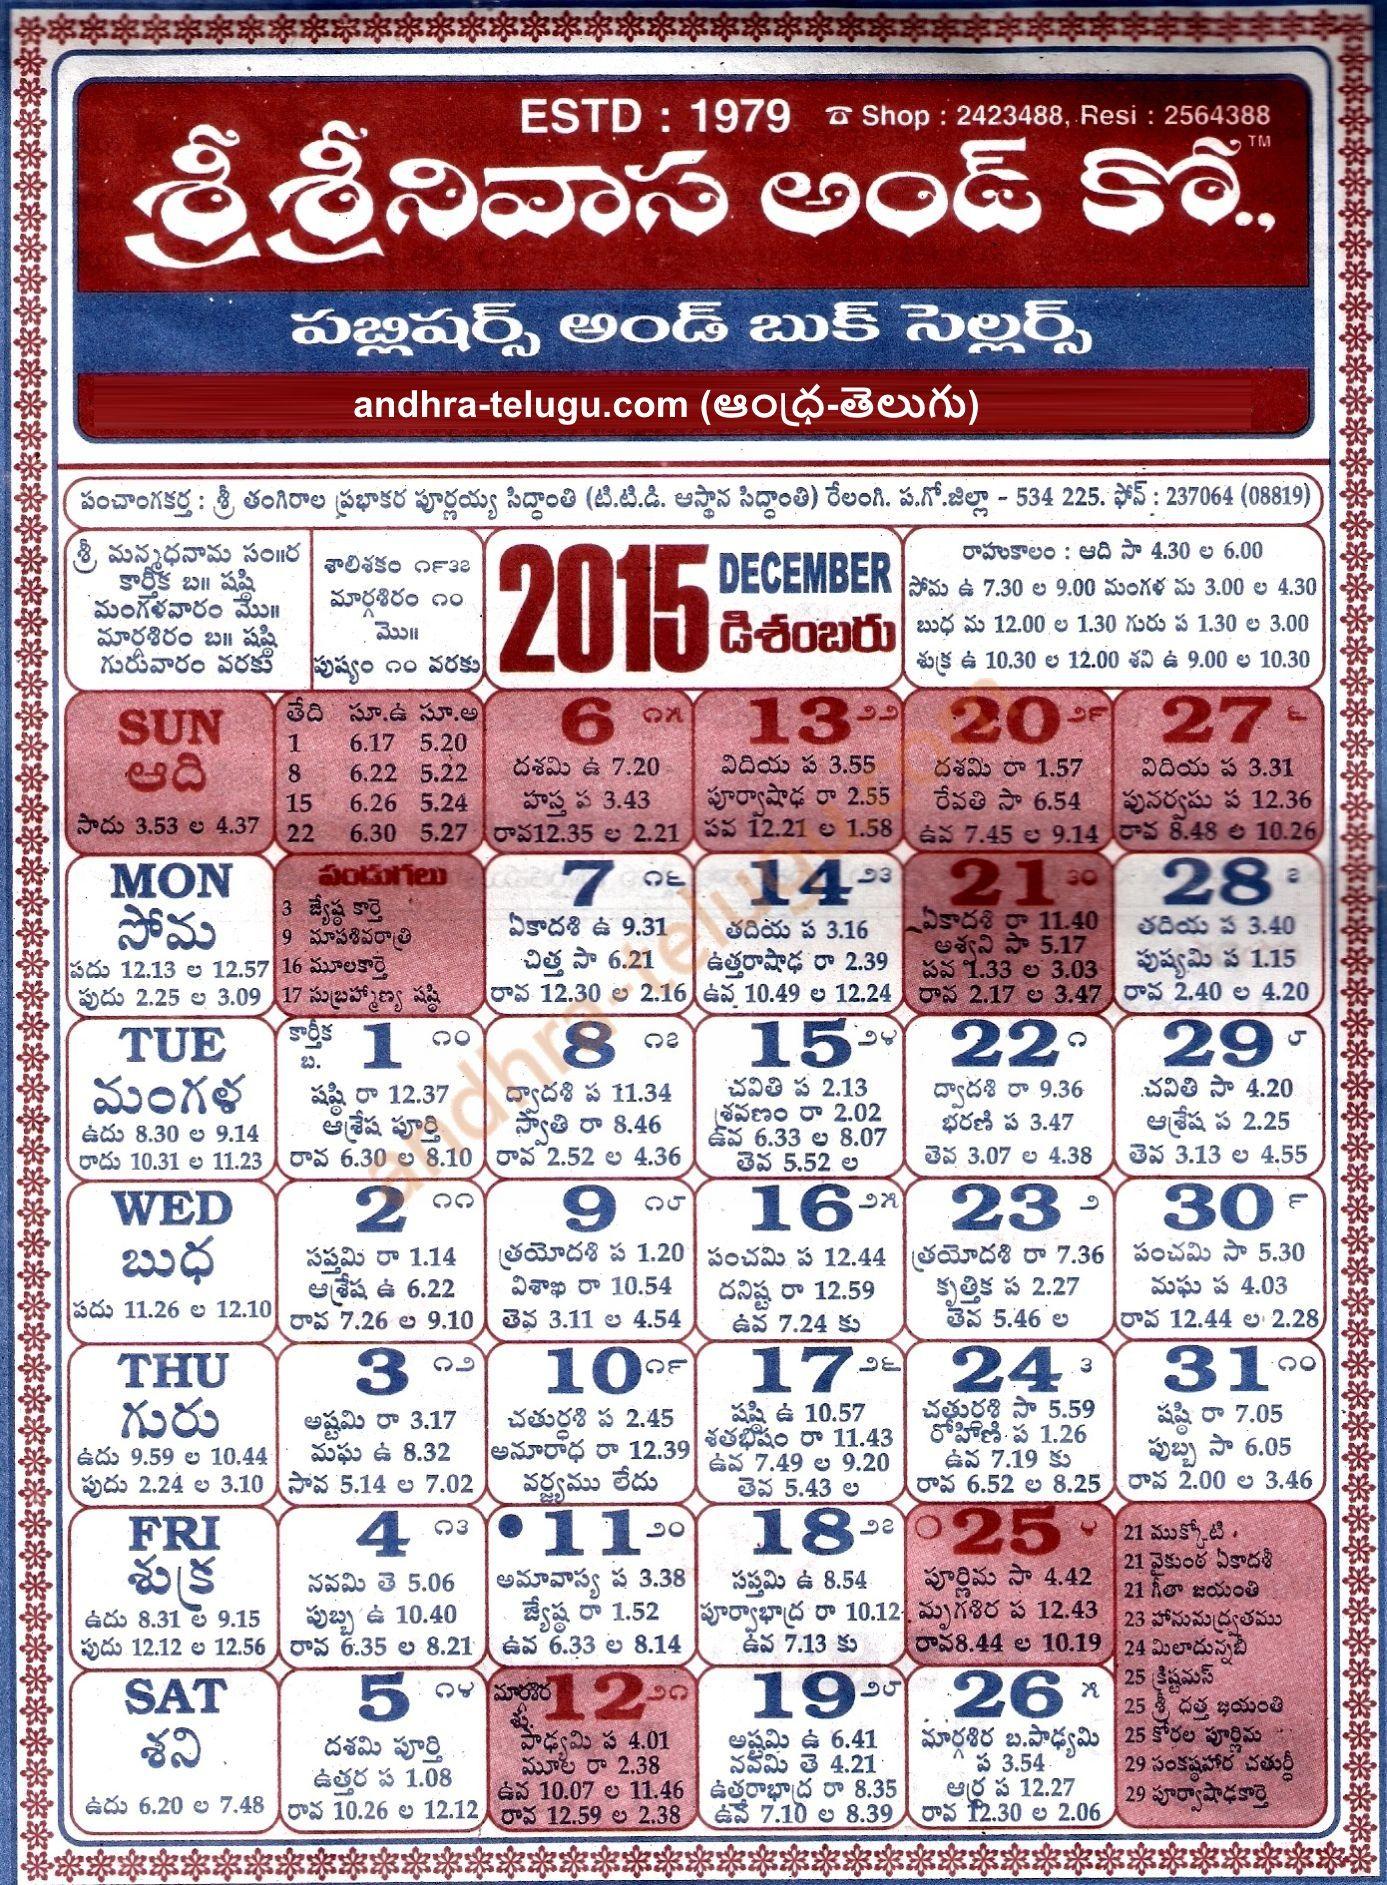 How To Read Telugu Calendar | Printable Calendar 2020 2021 For Bingo At Turning Stone March 13